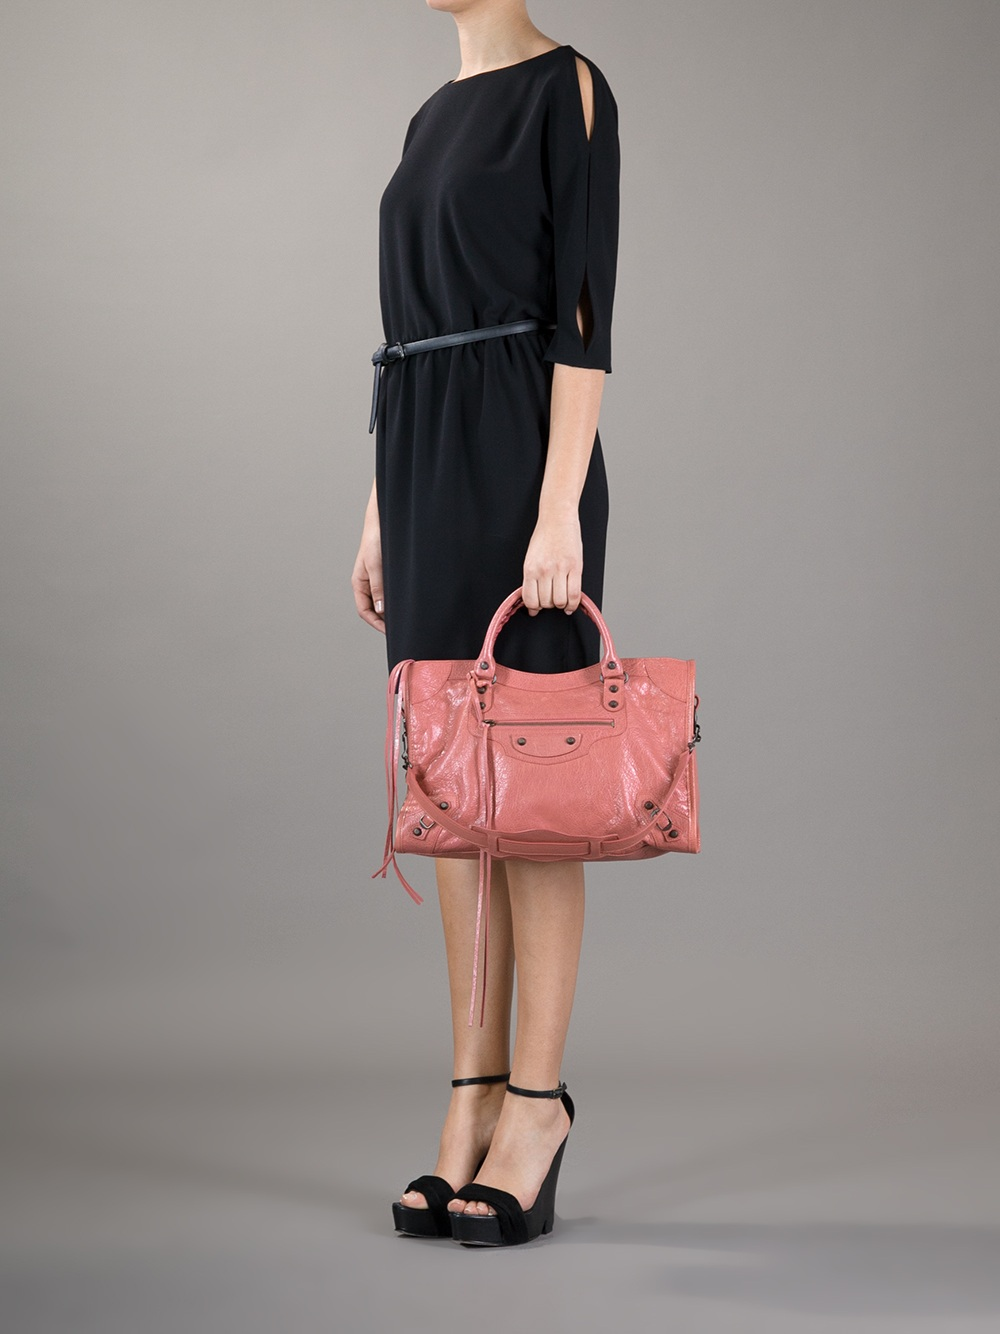 Balenciaga Classic City Tote in Rose (Pink)